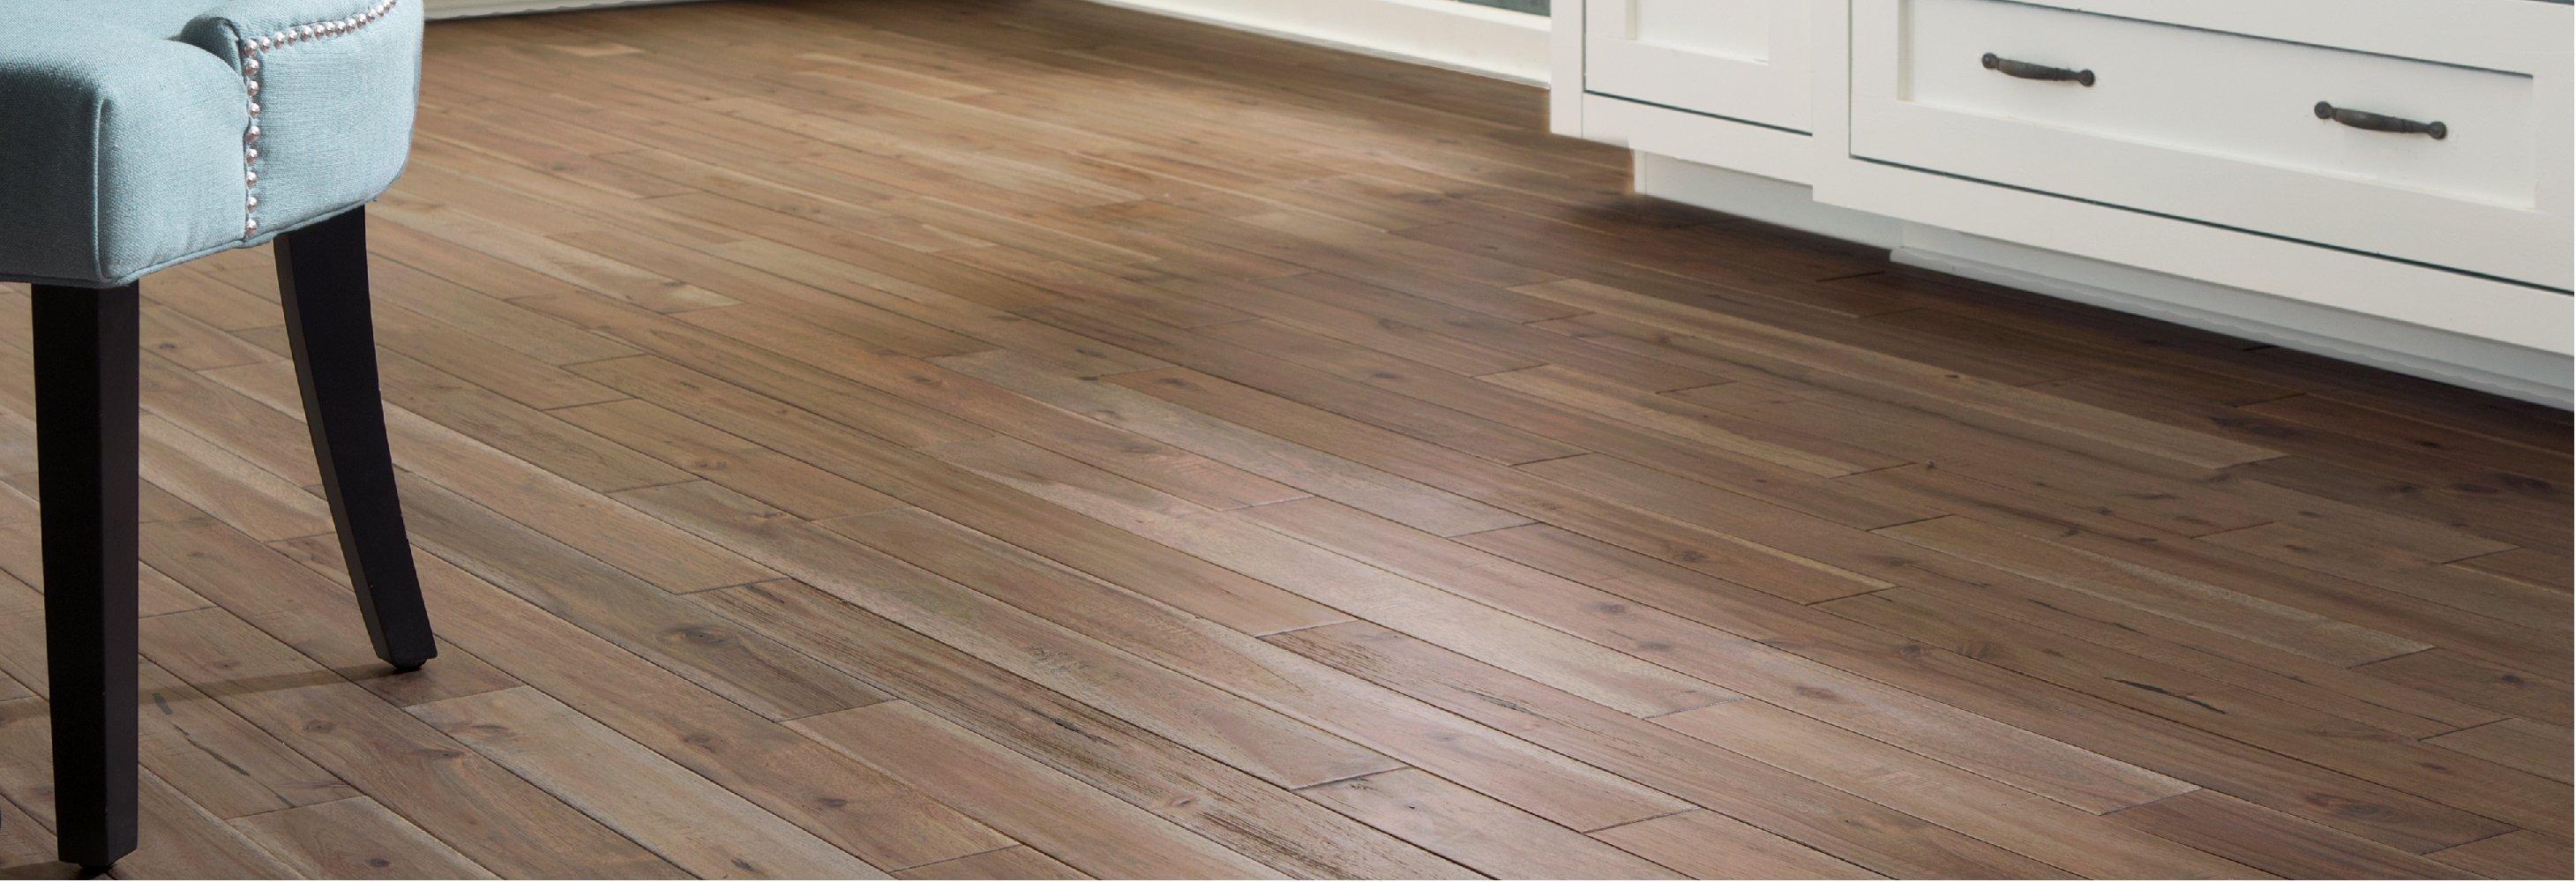 solid hardwood flooring BPBLRUA